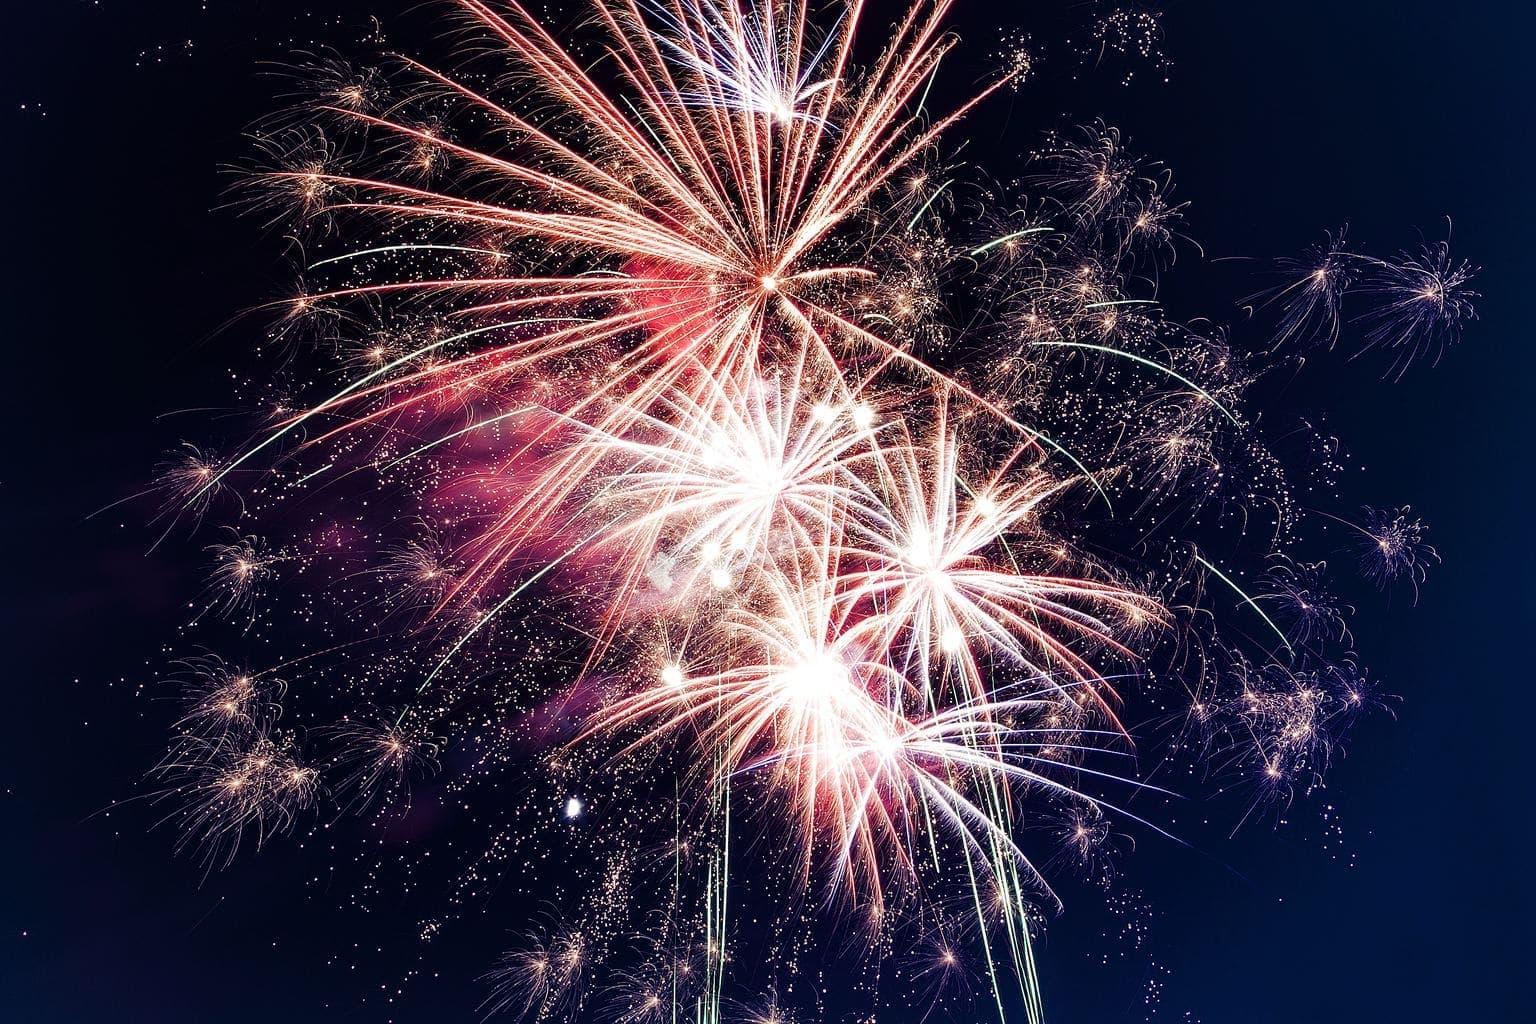 Fireworks Displays in North Yorkshire